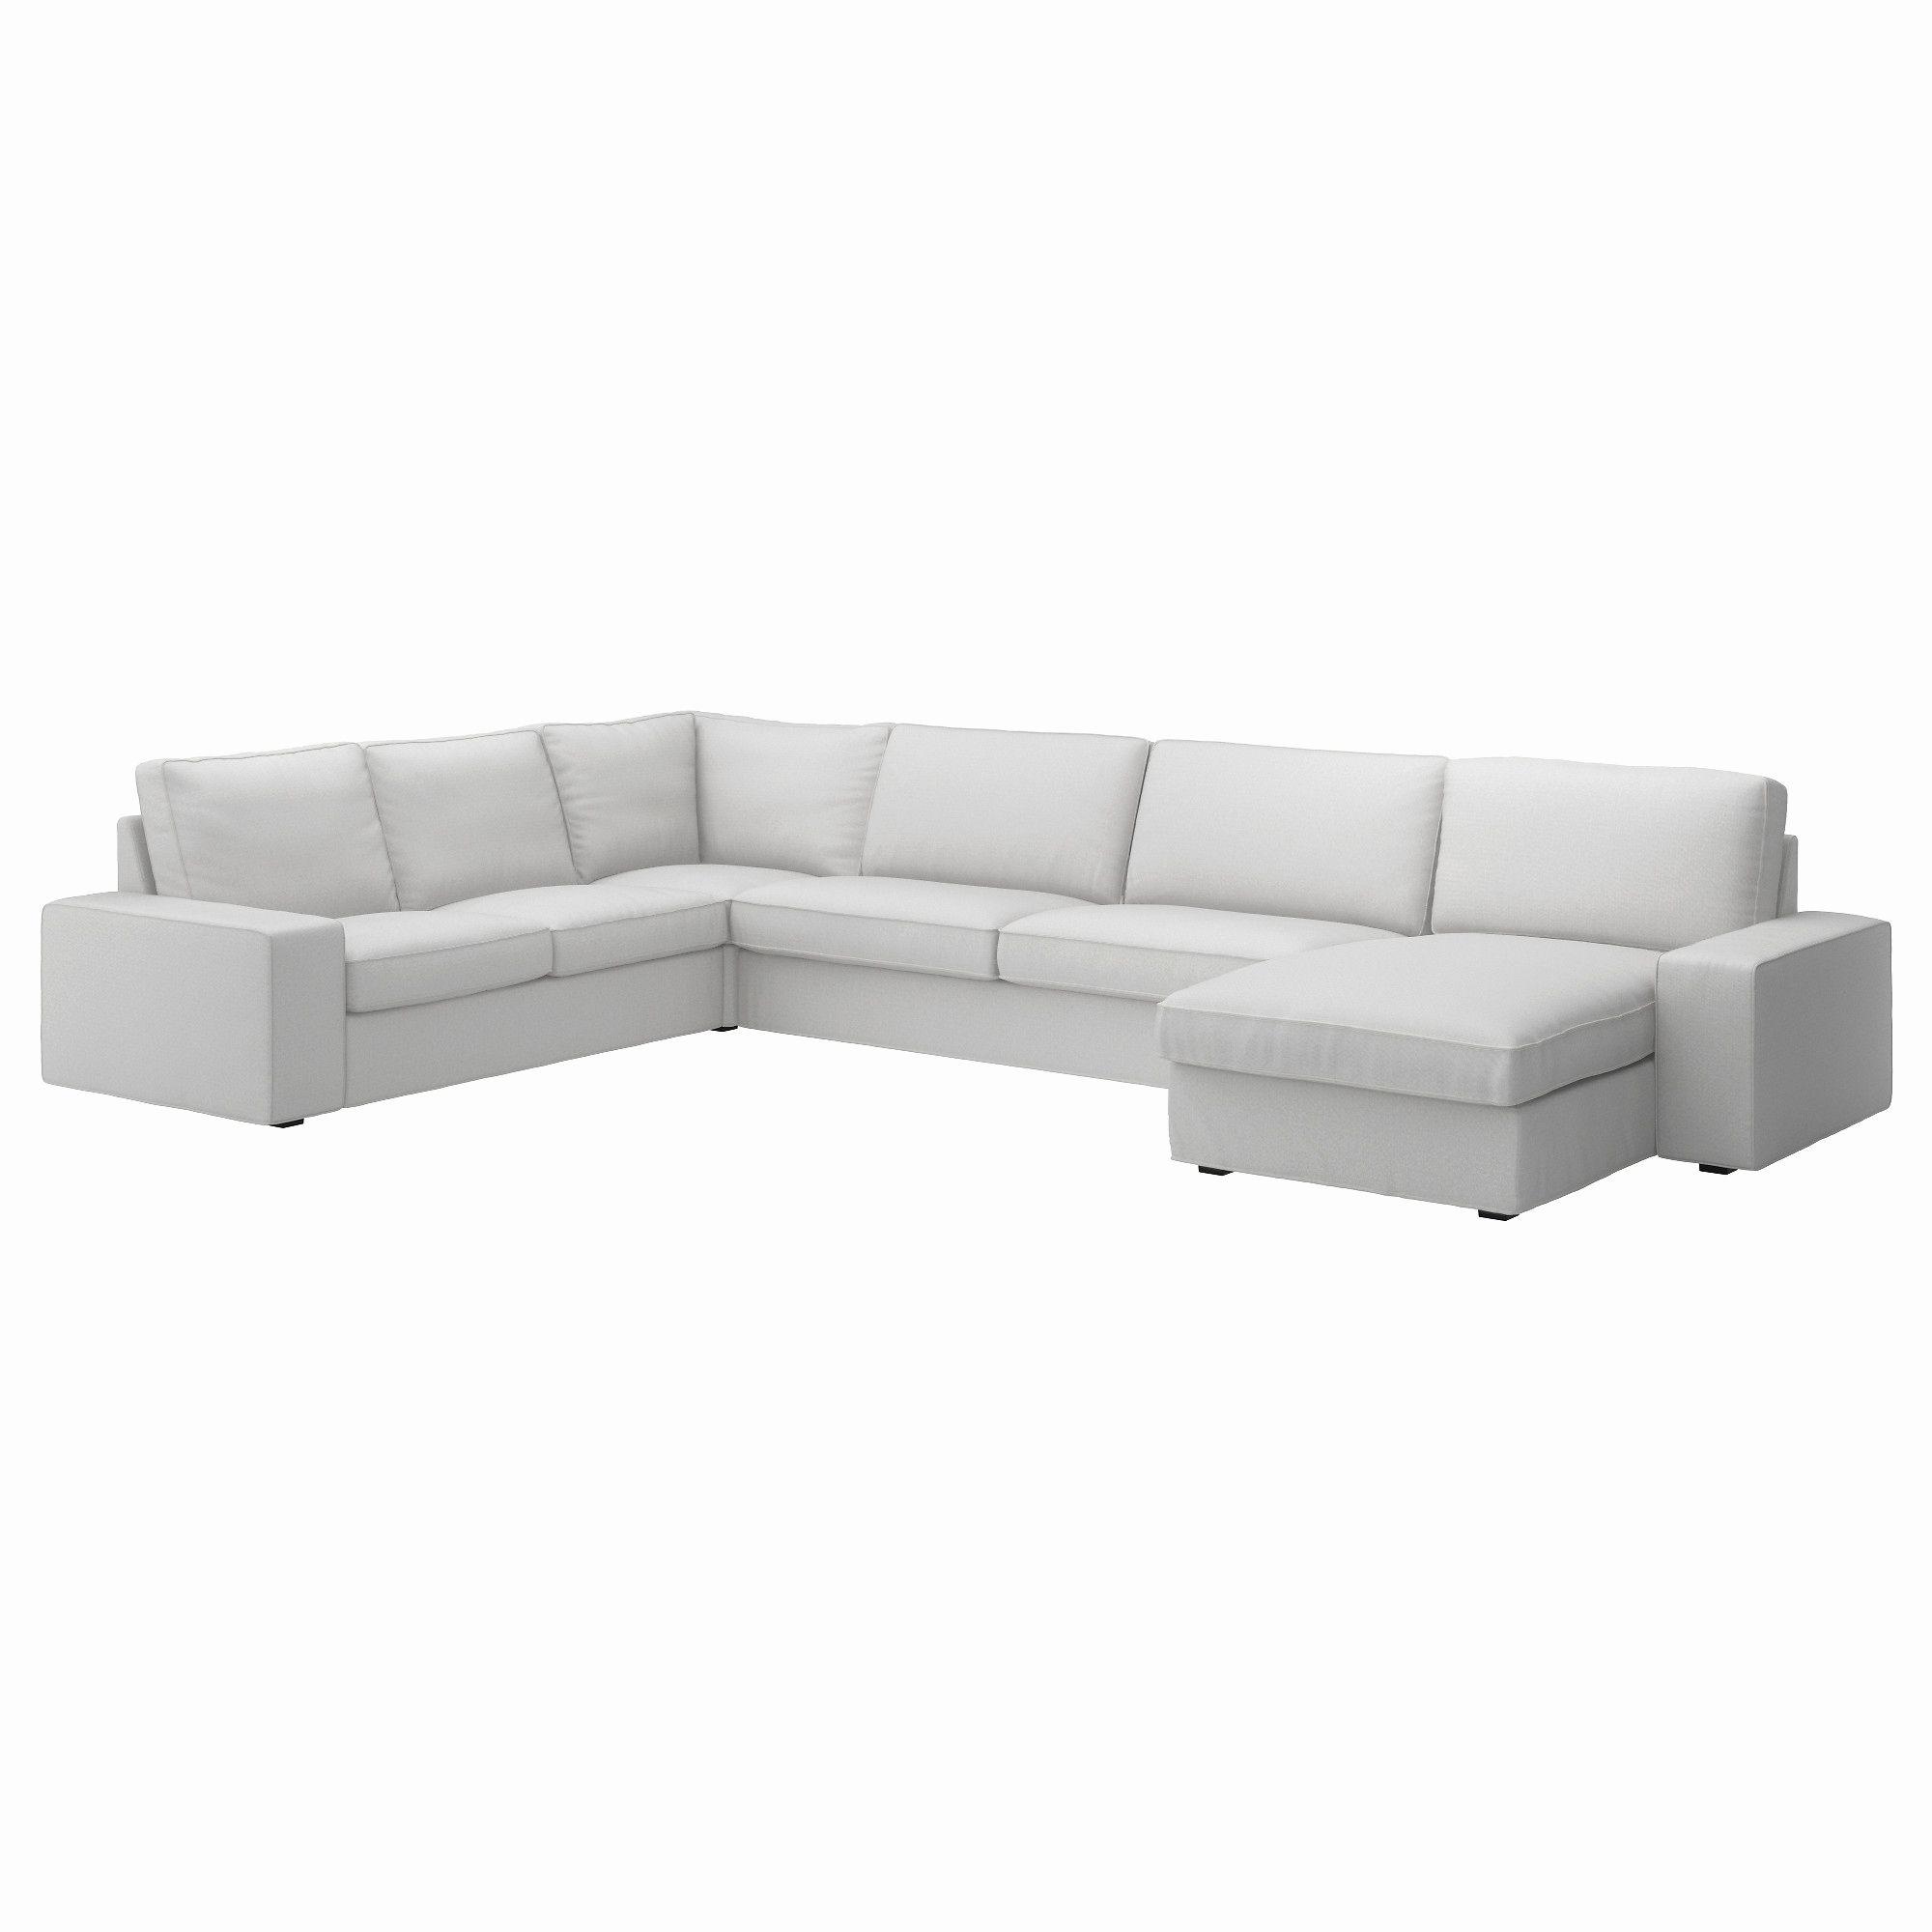 Inspirational Ikea Grey Corner Sofa Pics Ikea Grey Corner Sofa Best Of Kivik Corner Sofa 6 Seat With Chaise L Kivik Sofa Grey Corner Sofa Corner Sofa